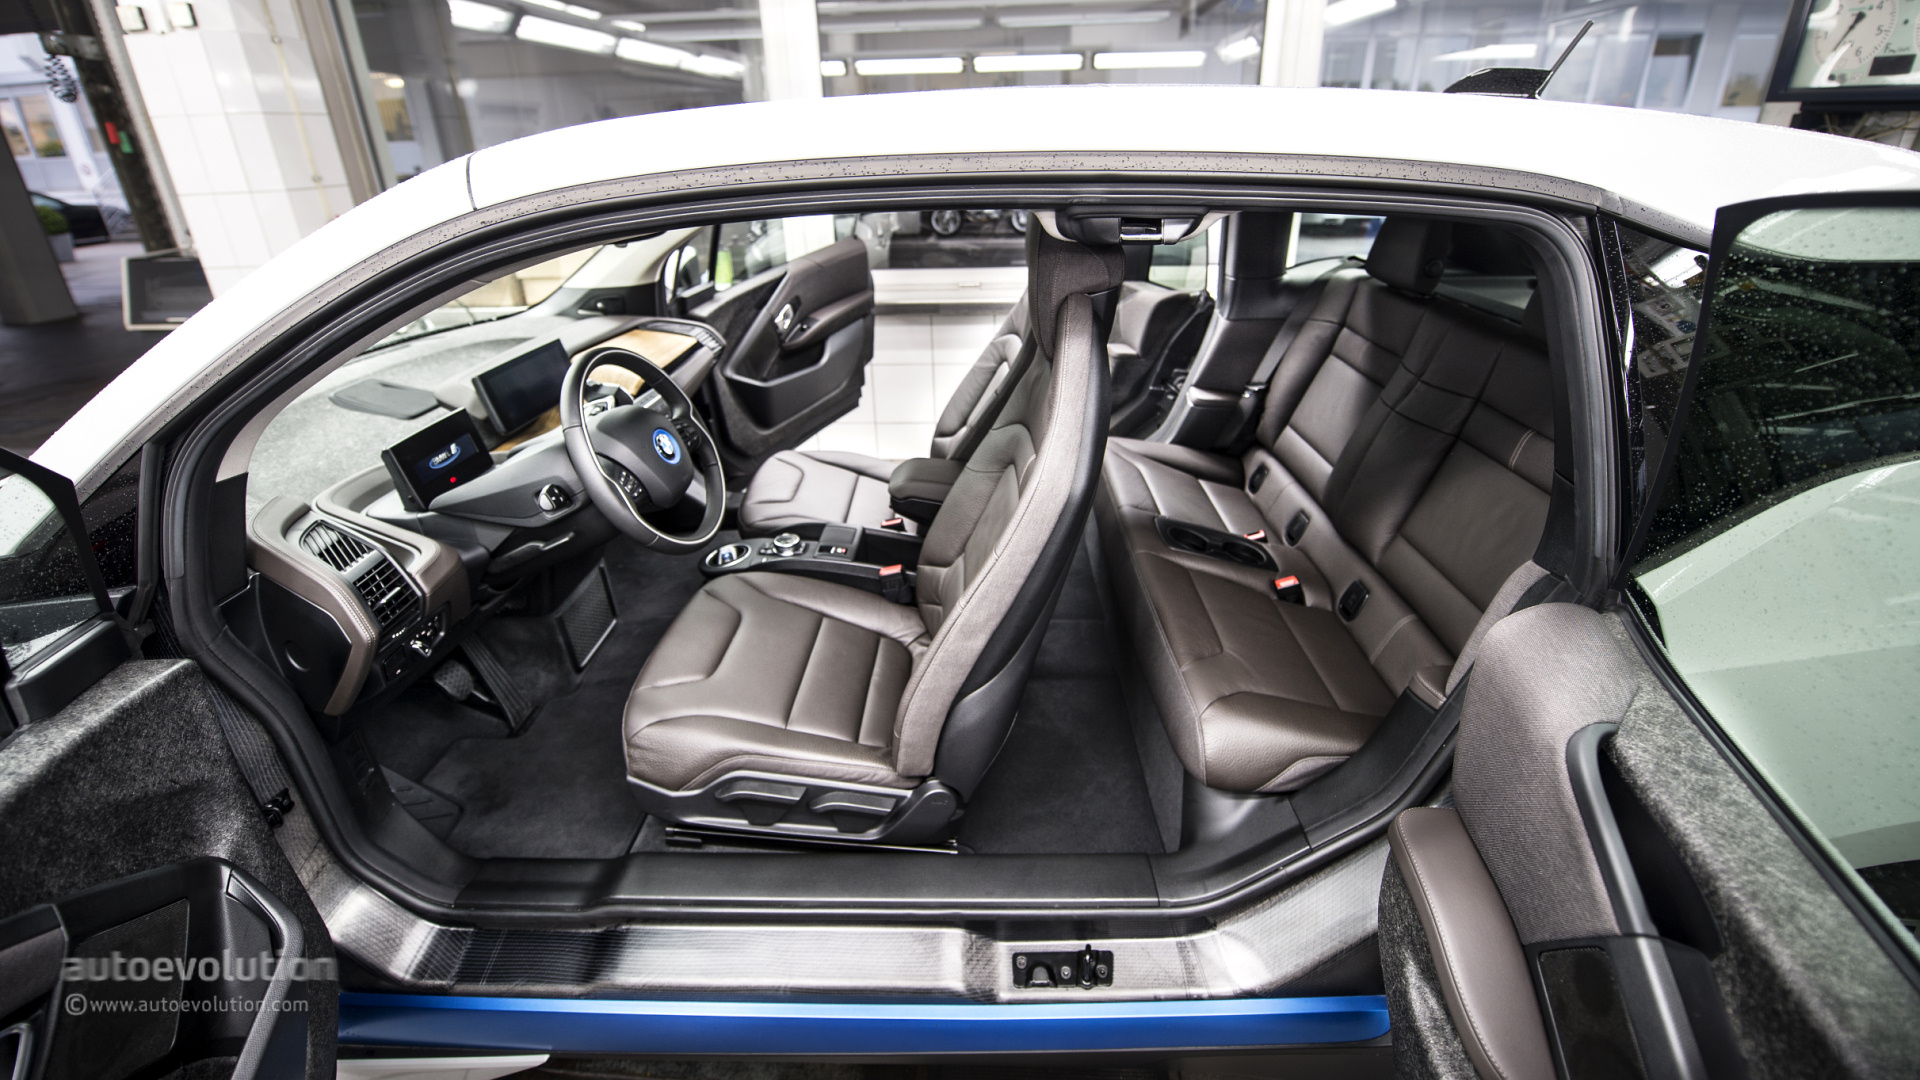 Bmw I8 Pink >> BMW i3 Review (Page 2) - autoevolution